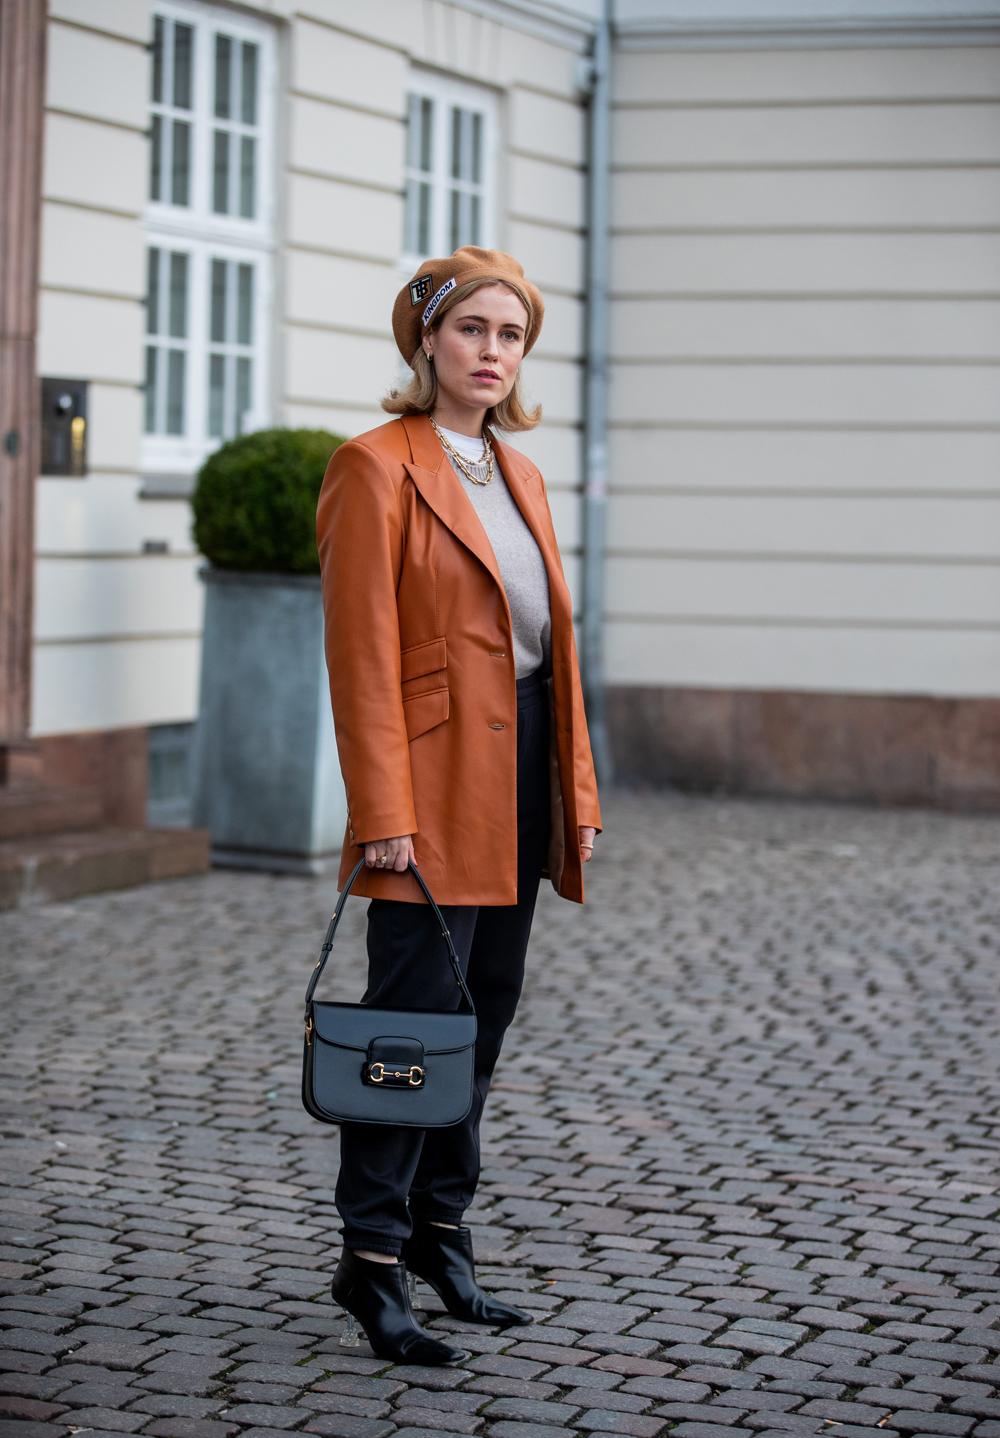 Koppenhágai Divathét 2020